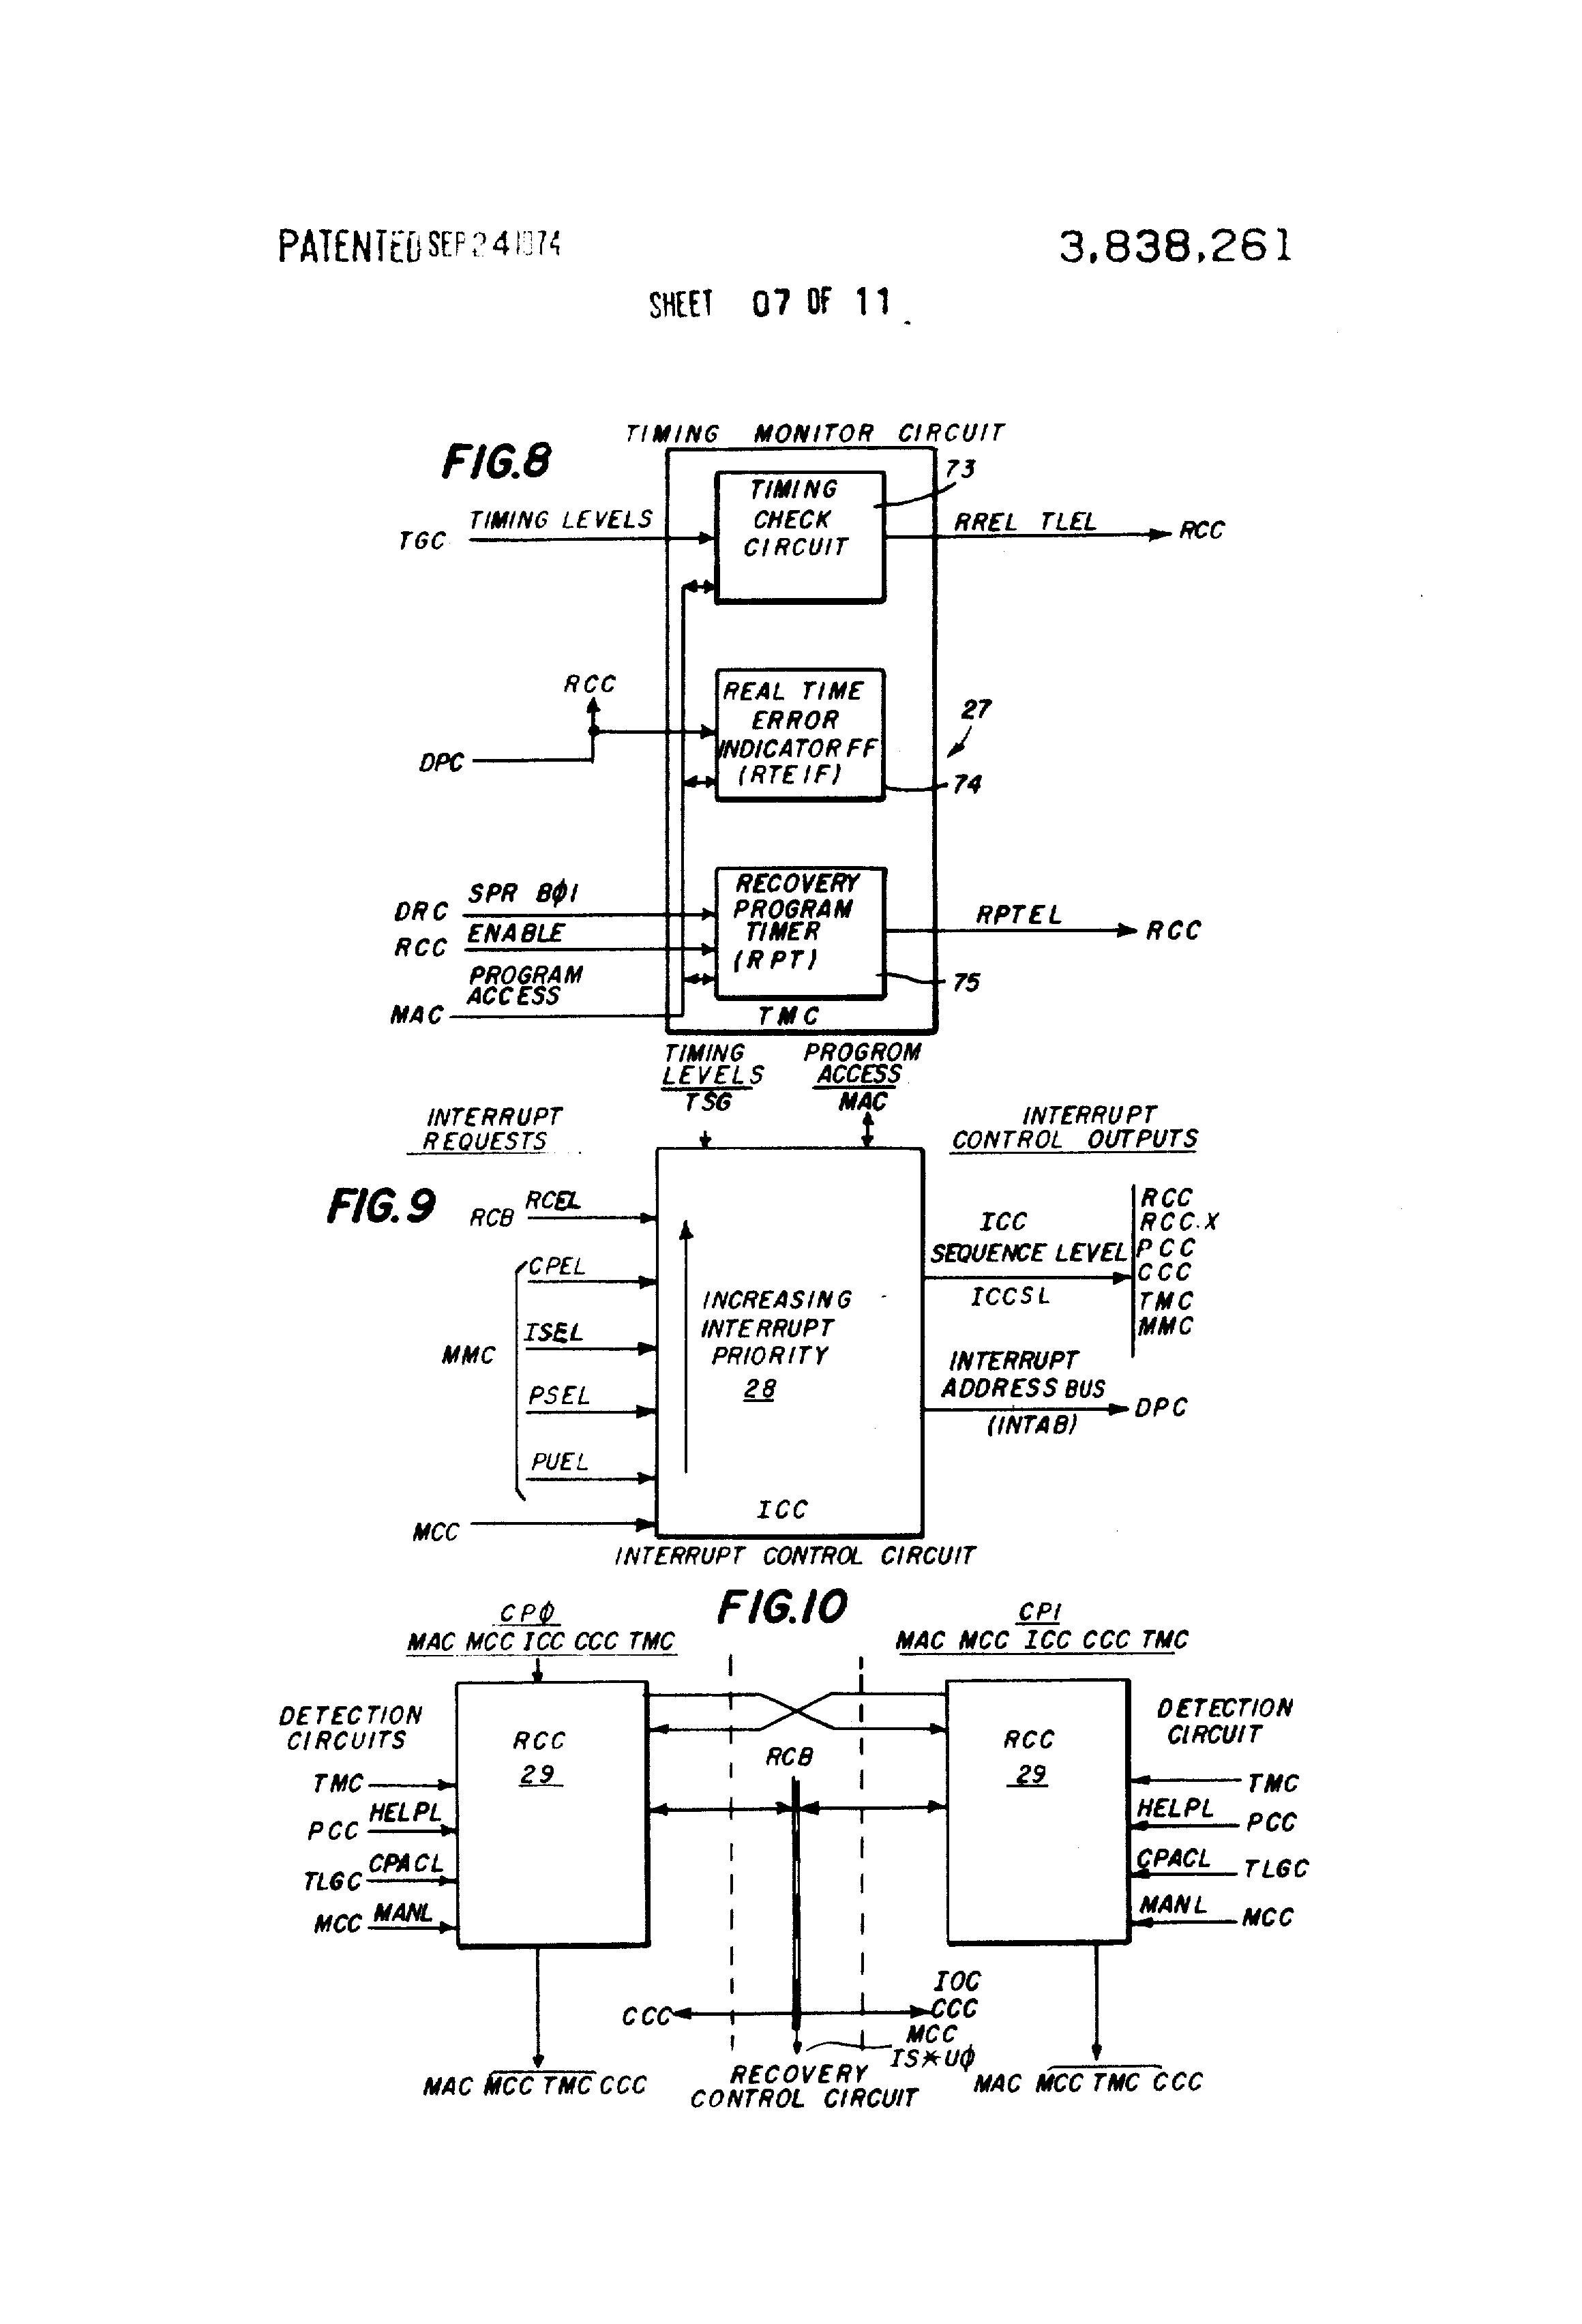 Nissan pathfinder wiring diagram swot internal external nissan 350z wiring diagram 2009 nissan altima stereo wiring us3838261 7 nissan 350z wiring diagramhtml sciox Gallery